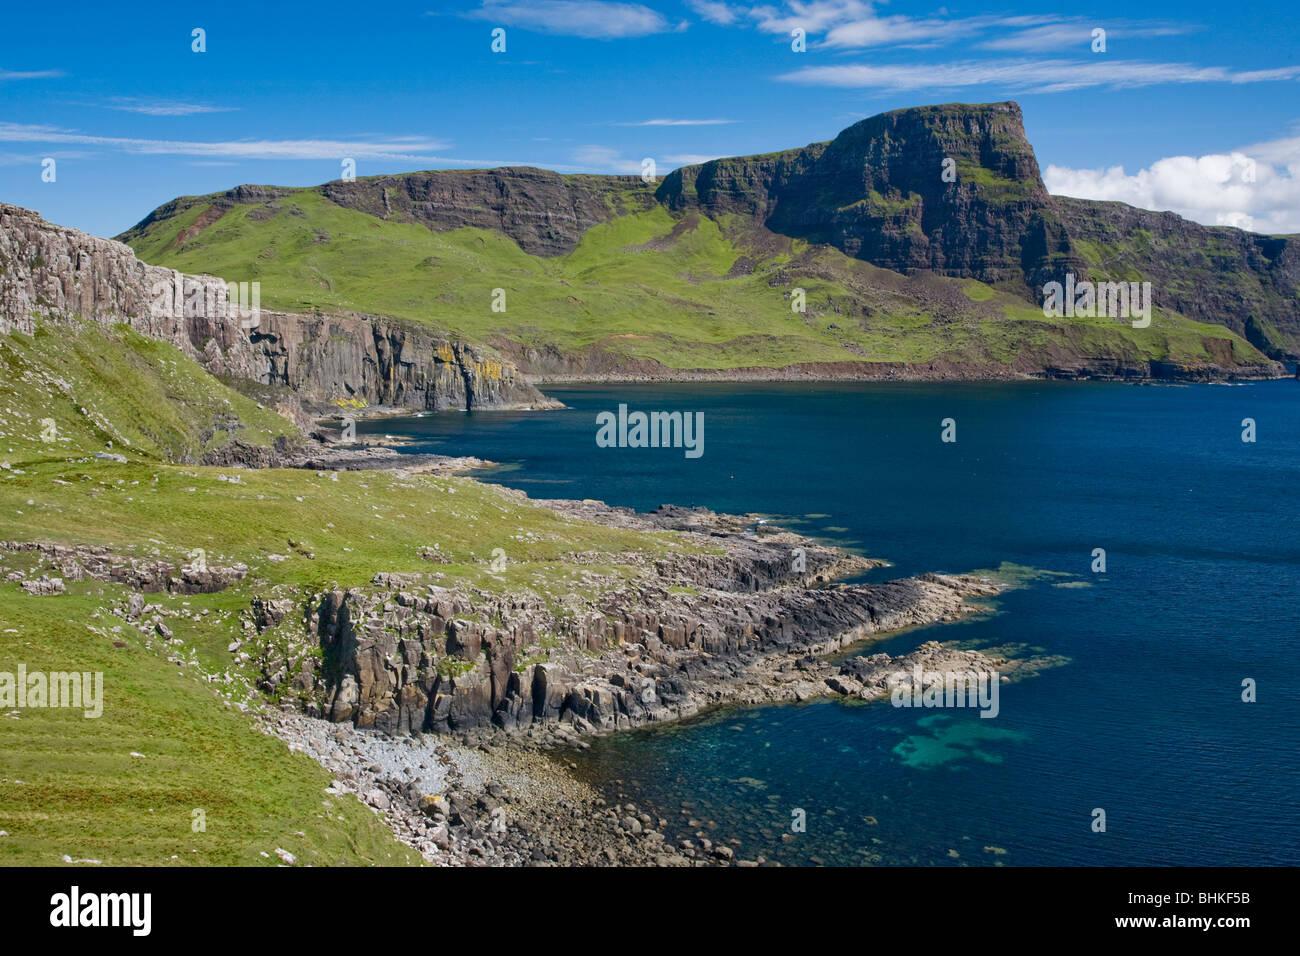 Moonen Bay and Waterstein Head from Neist Point, Isle of Skye, Scotland, UK Stock Photo